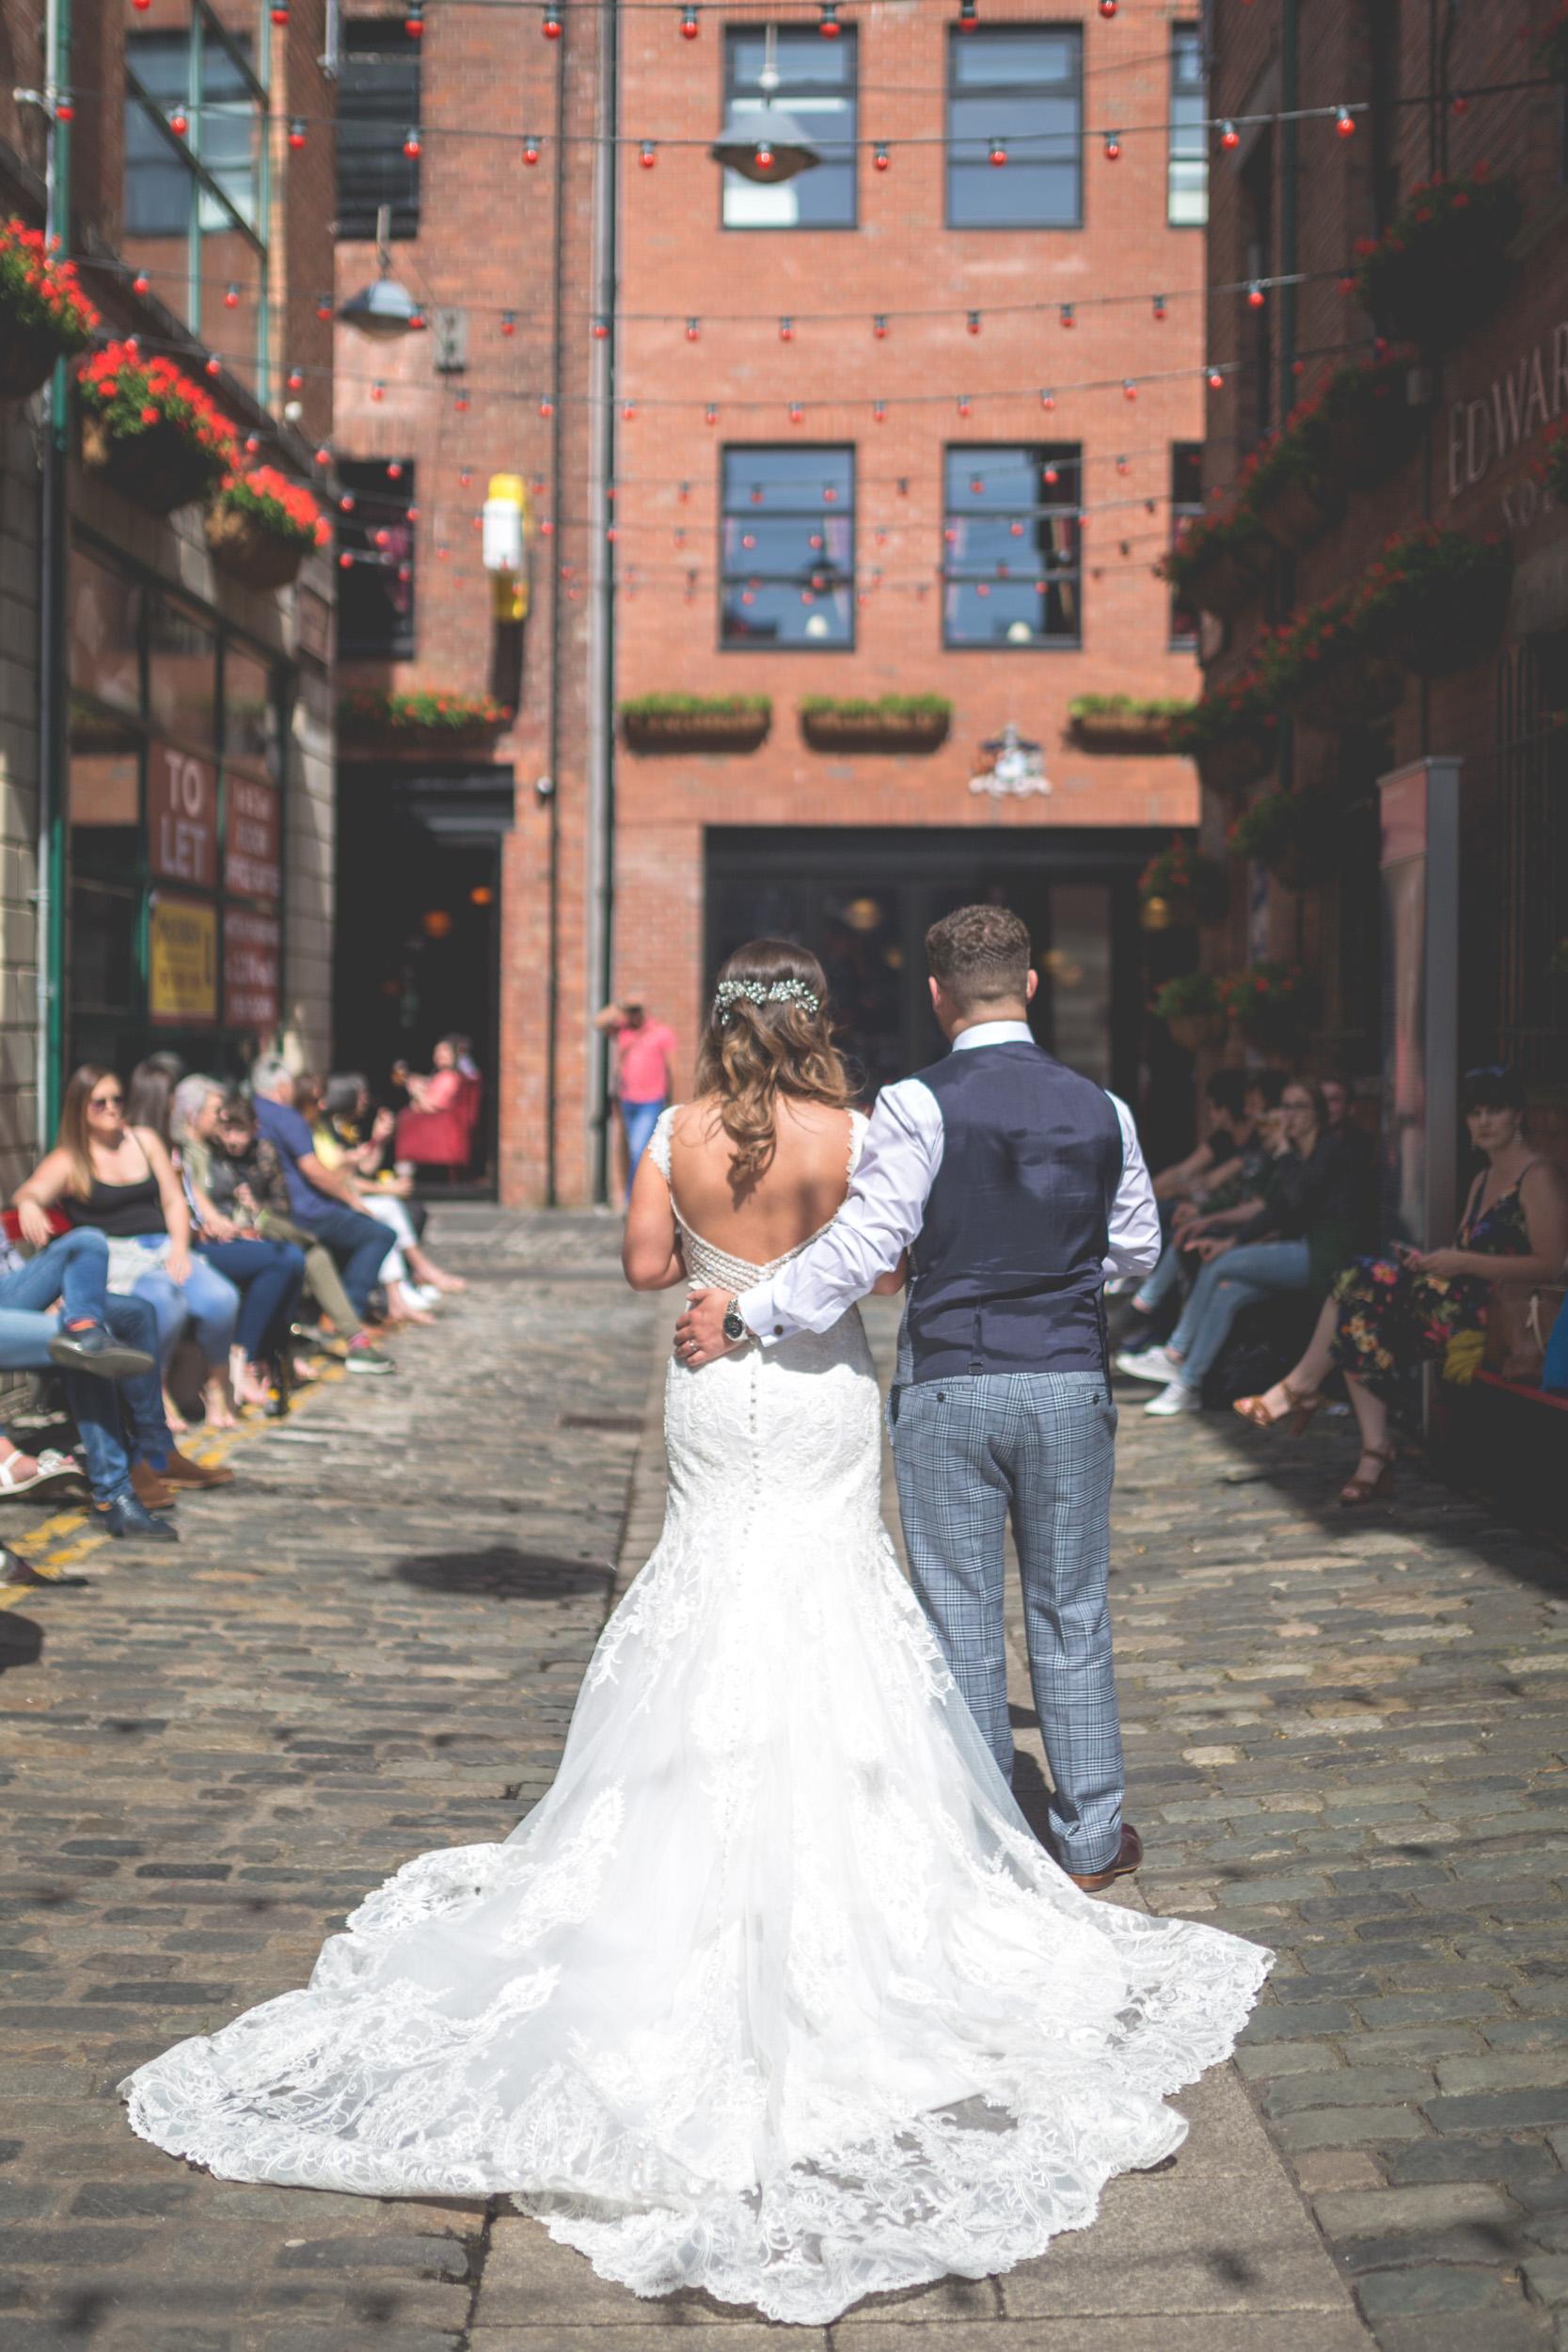 Brian McEwan   Northern Ireland Wedding Photographer   Rebecca & Michael   Portraits-114.jpg